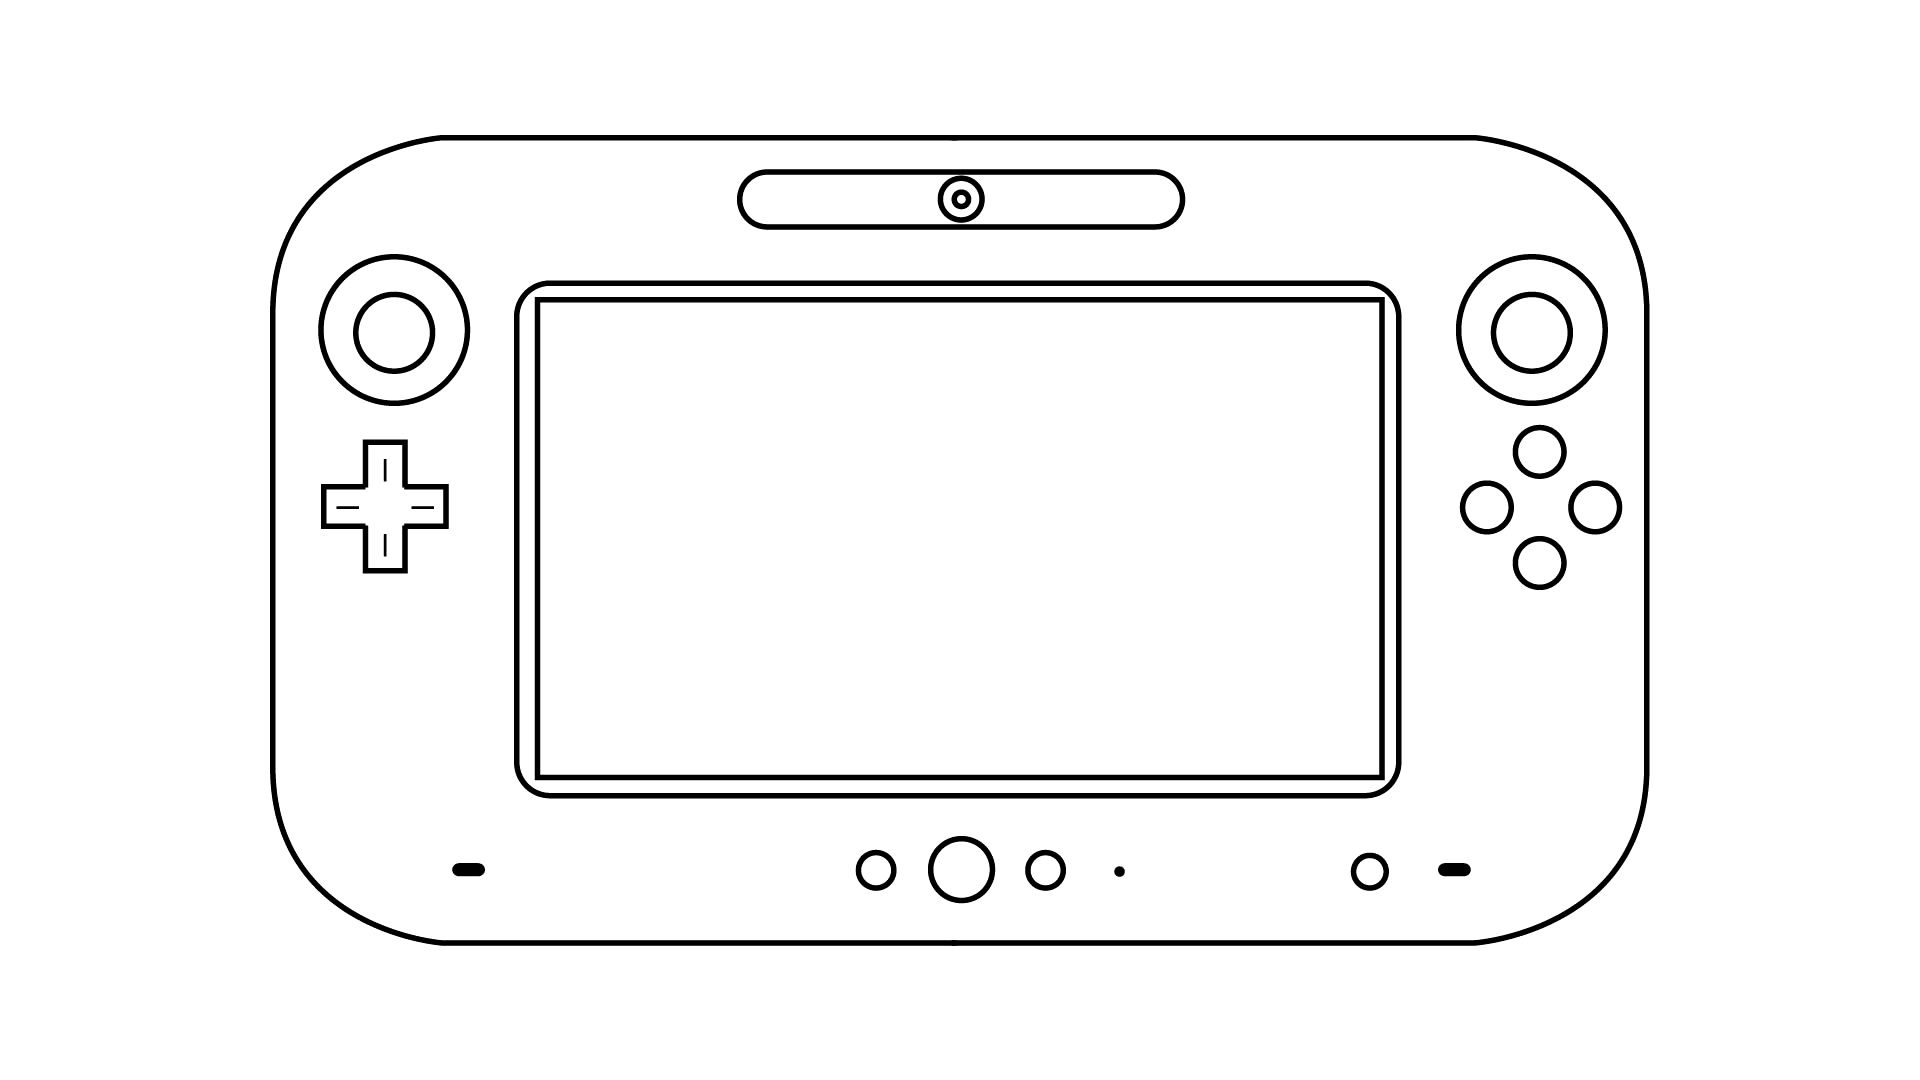 Super Mario Wii U Coloring Pages Cute Valentines Day Box Ideas Wii Mario Coloring Pages Super Mario Coloring Pages Mario Wii